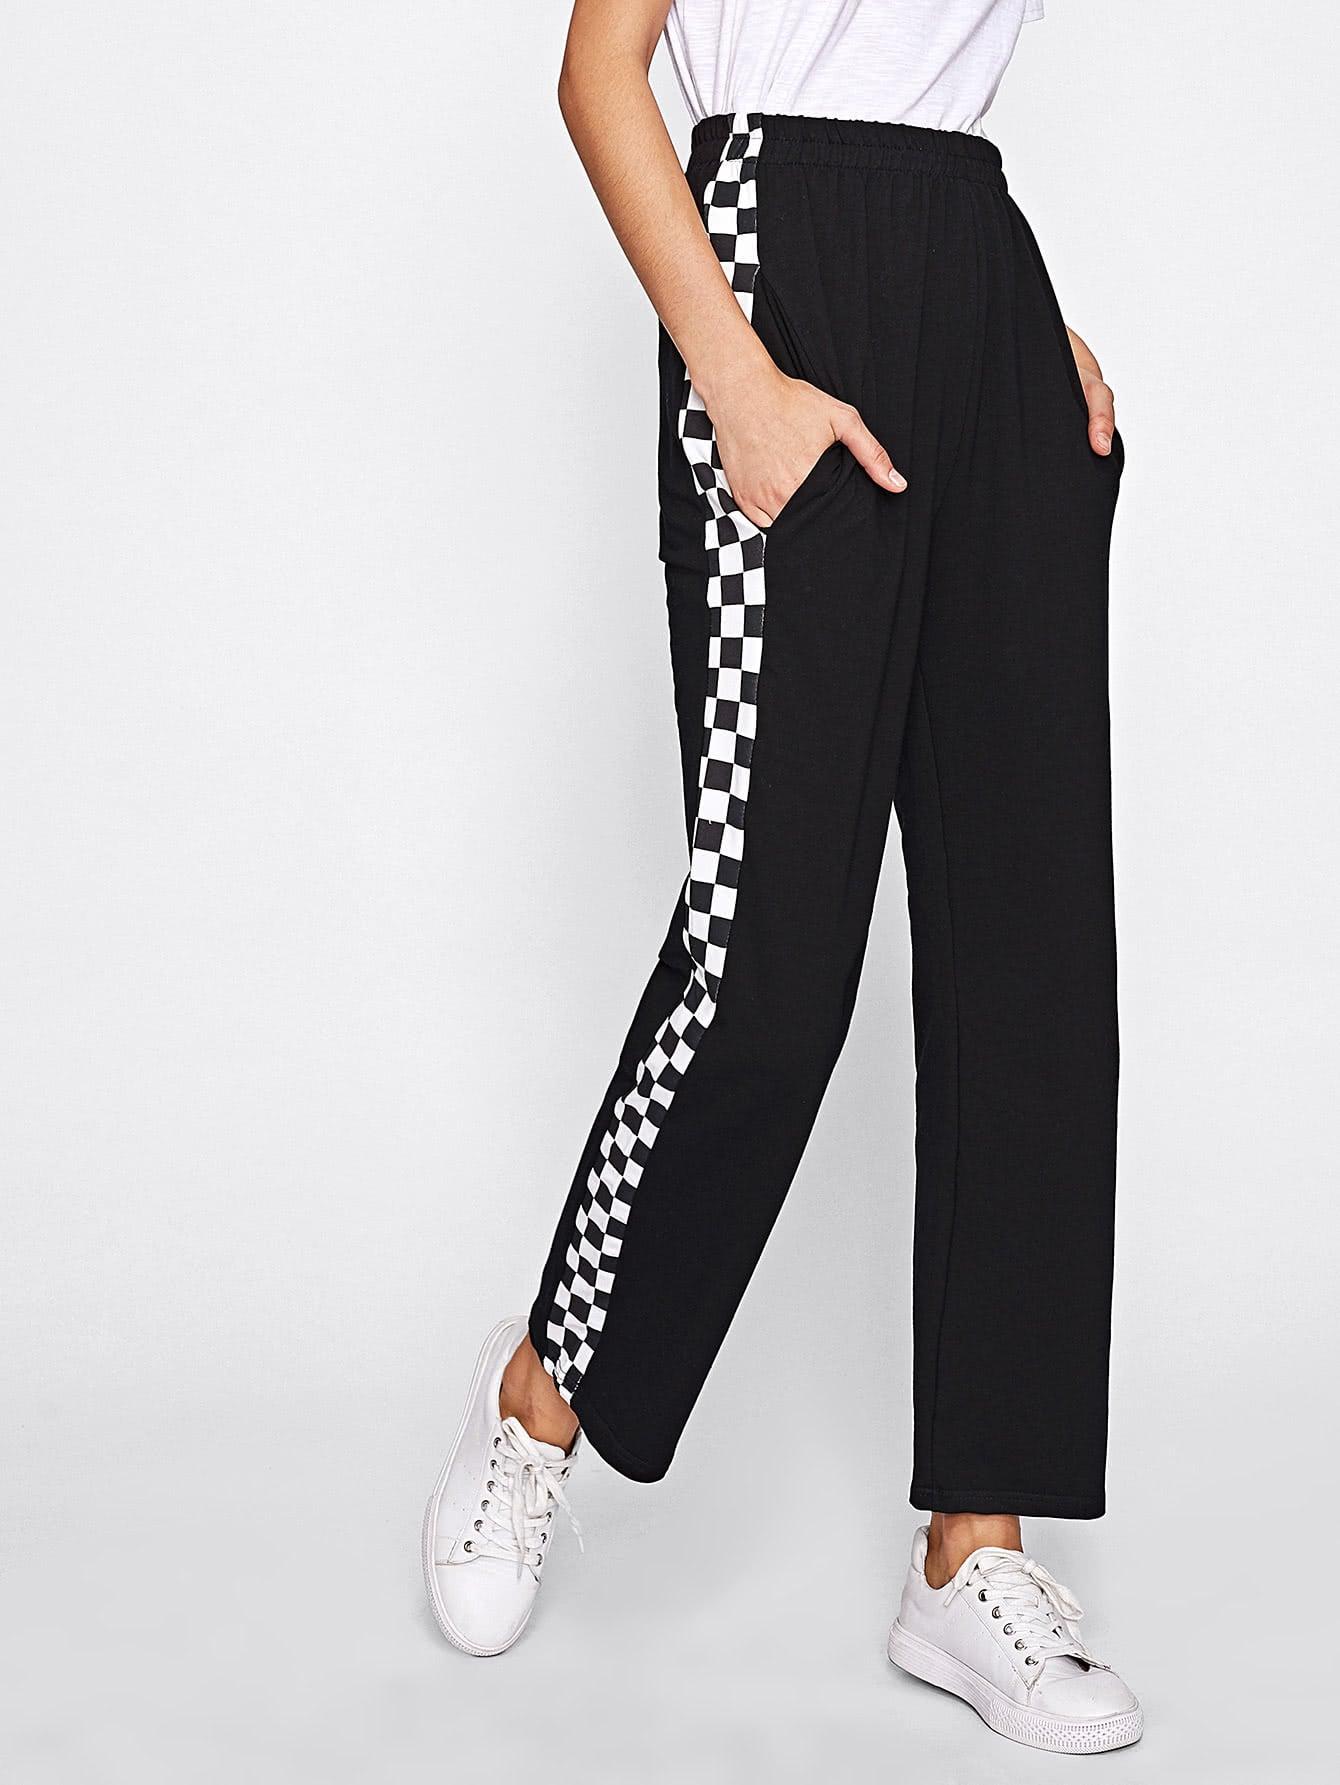 Модные брюки с клетчатыми лампасами | Shein